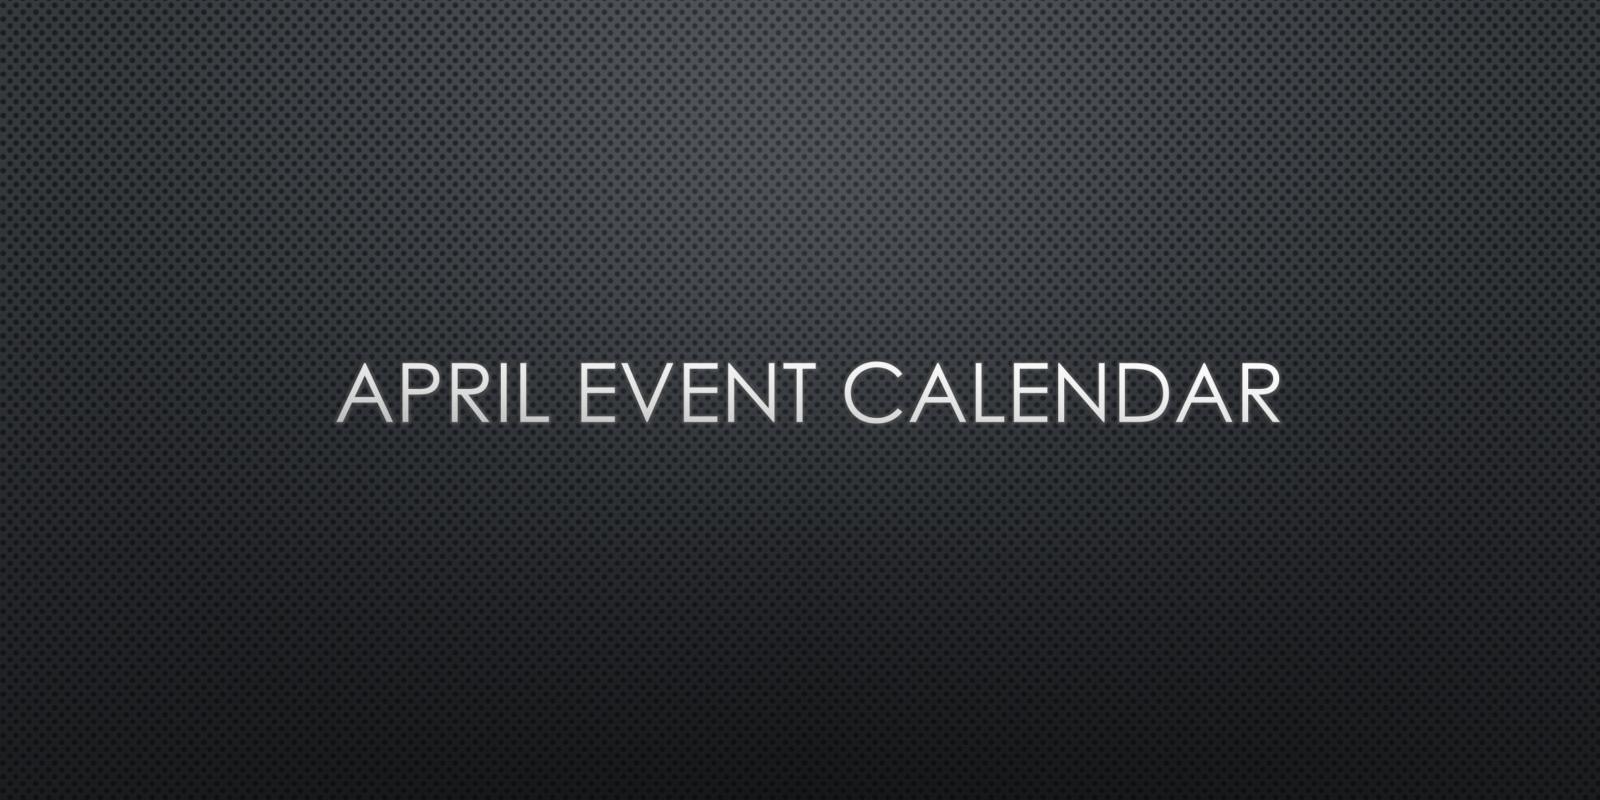 April 2019 Event Calendar